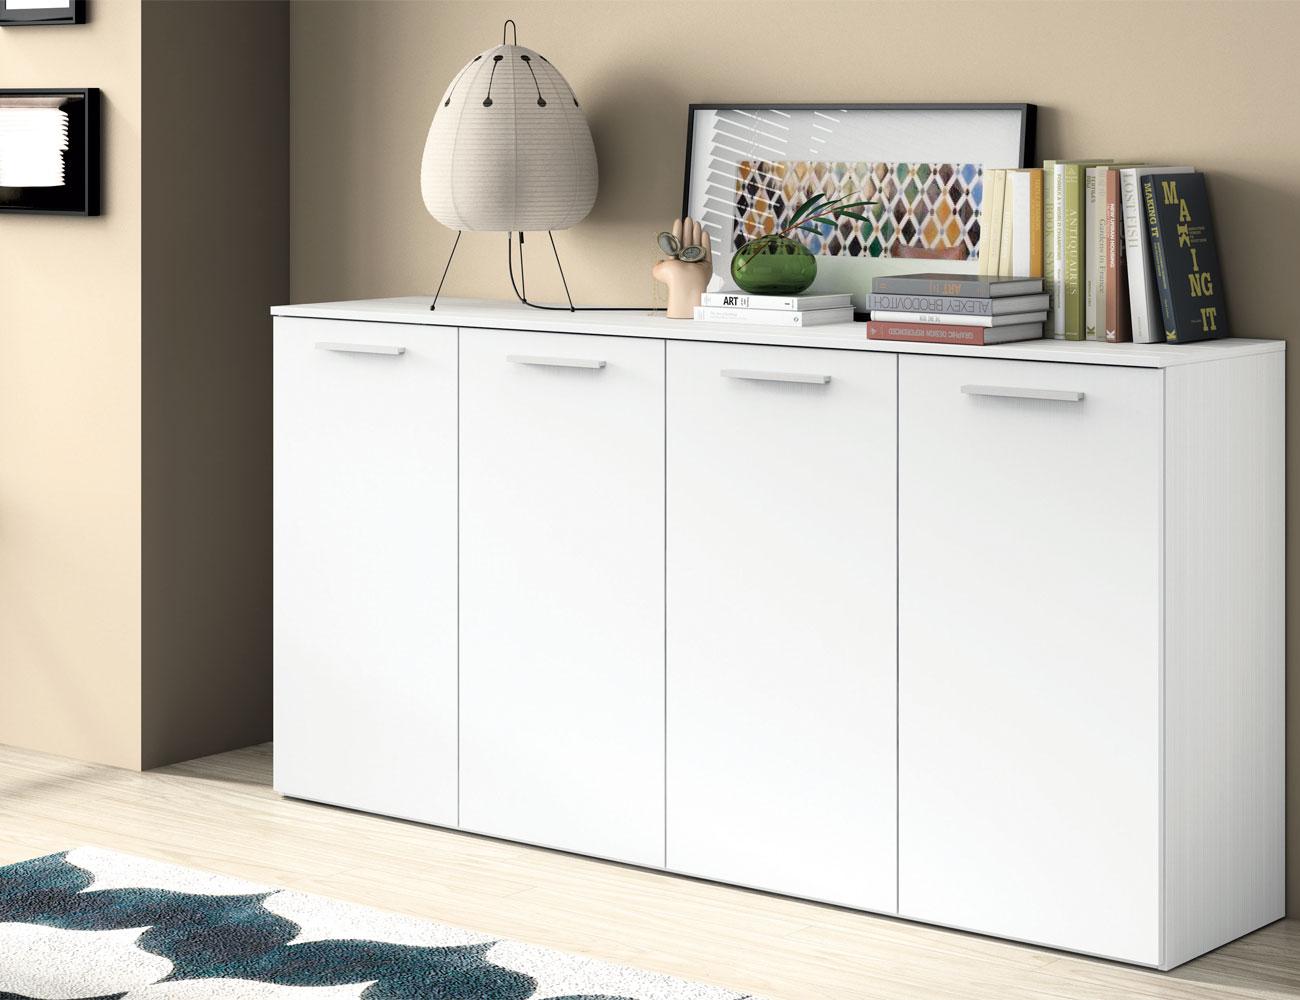 Mueble salon moderno aparador blanco 4148